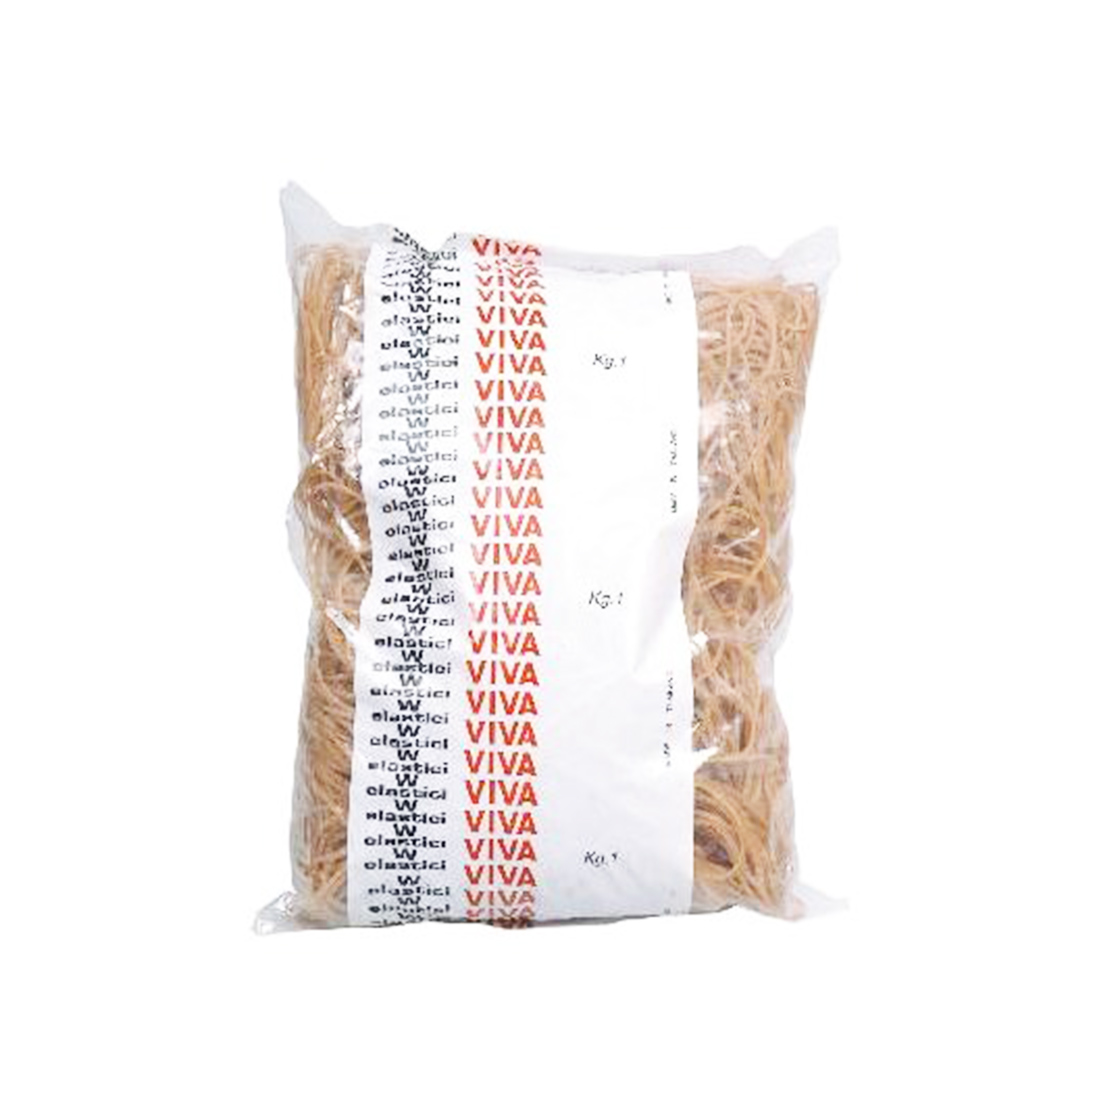 ELASTICI PARA IN BUSTA 30mm 1kg